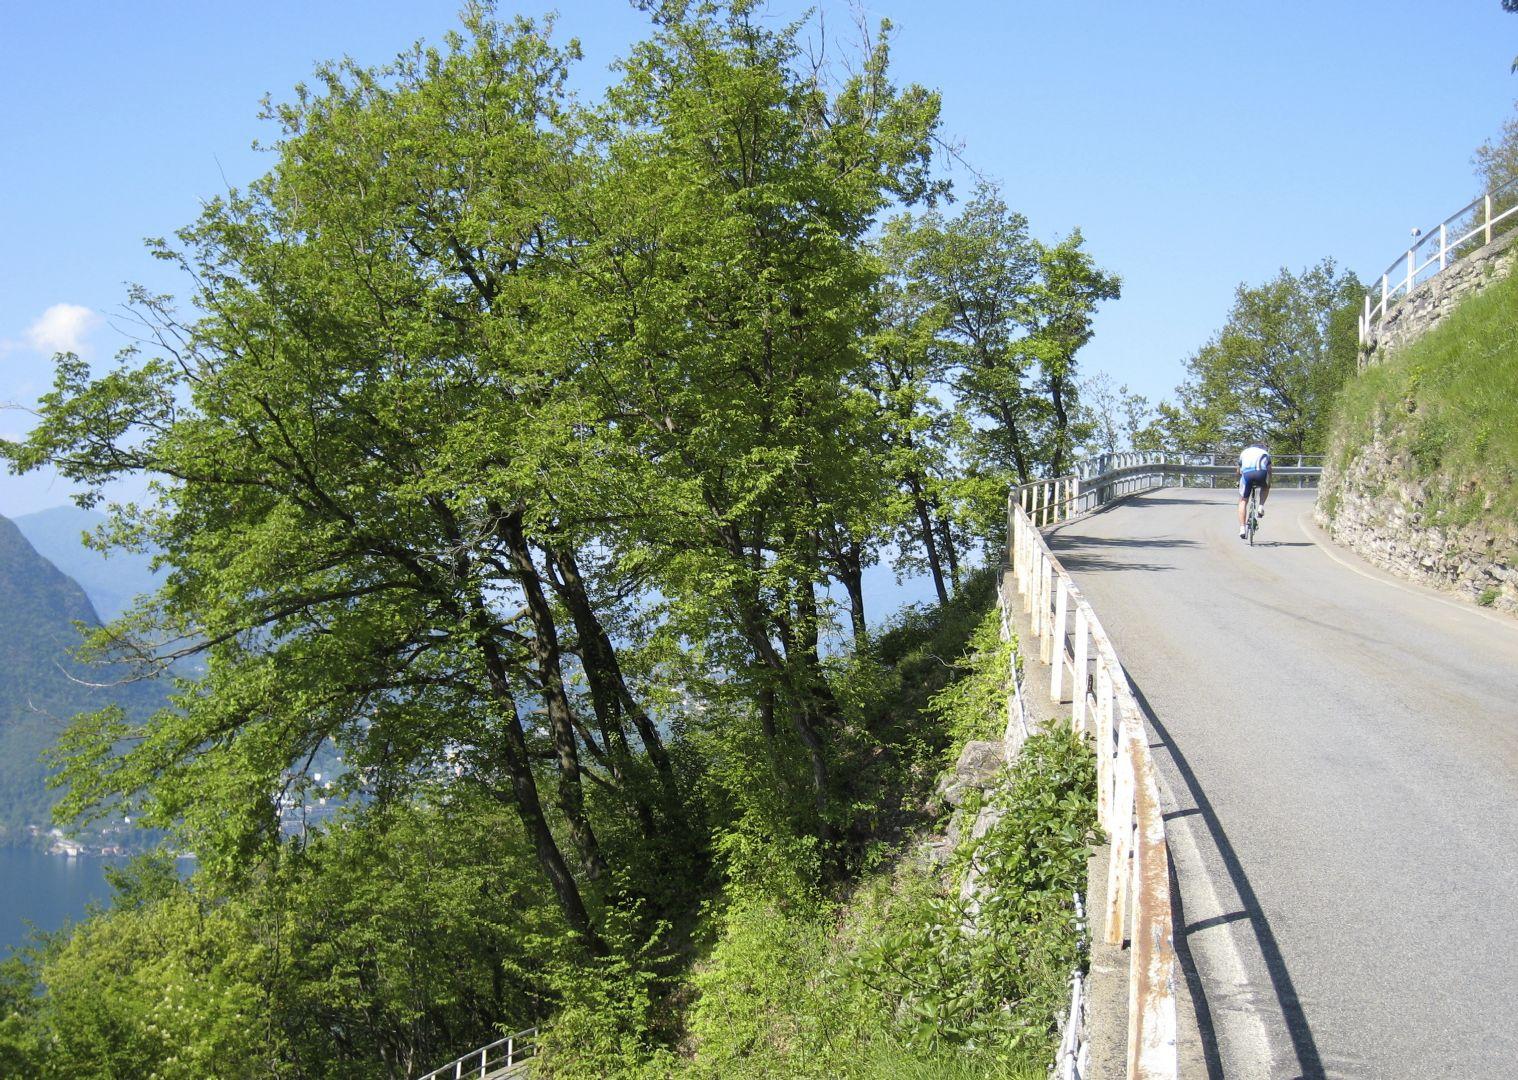 Immagine 2164.jpg - Italy - Lakes of Lombardia - Guided Road Cycling Holiday - Road Cycling